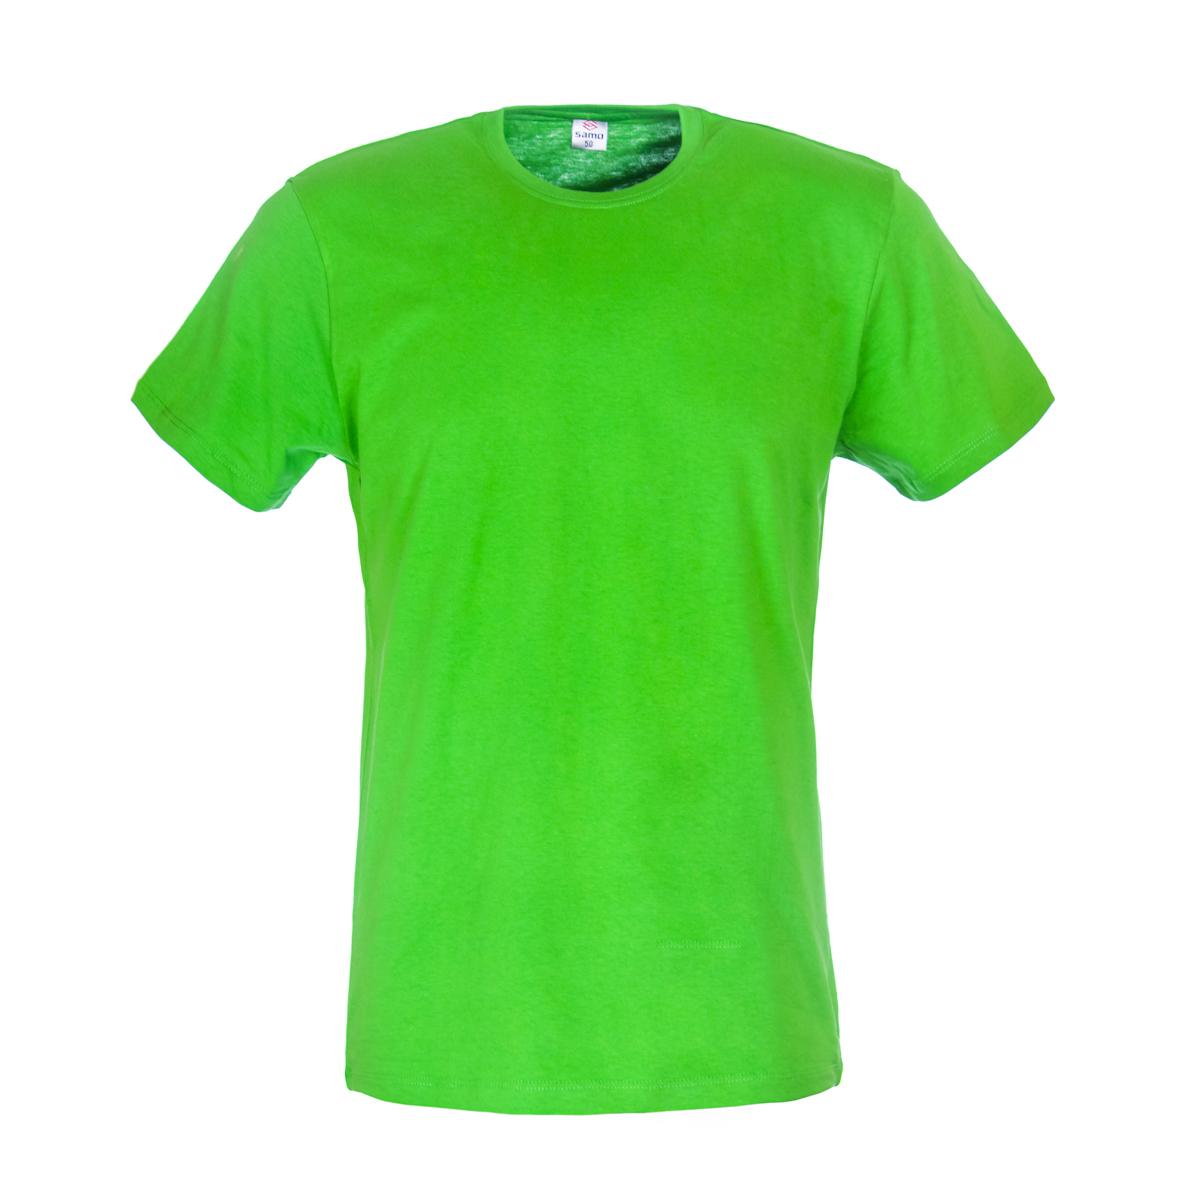 Муж. футболка арт. 04-0044 Зеленый р. 50Футболки и майки<br>Фактический ОГ:104 см<br>Фактический ОТ:104 см<br>Фактический ОБ:104 см<br>Длина по спинке:75 см<br>Рост:176-182 см<br><br>Тип: Муж. футболка<br>Размер: 50<br>Материал: Супрем